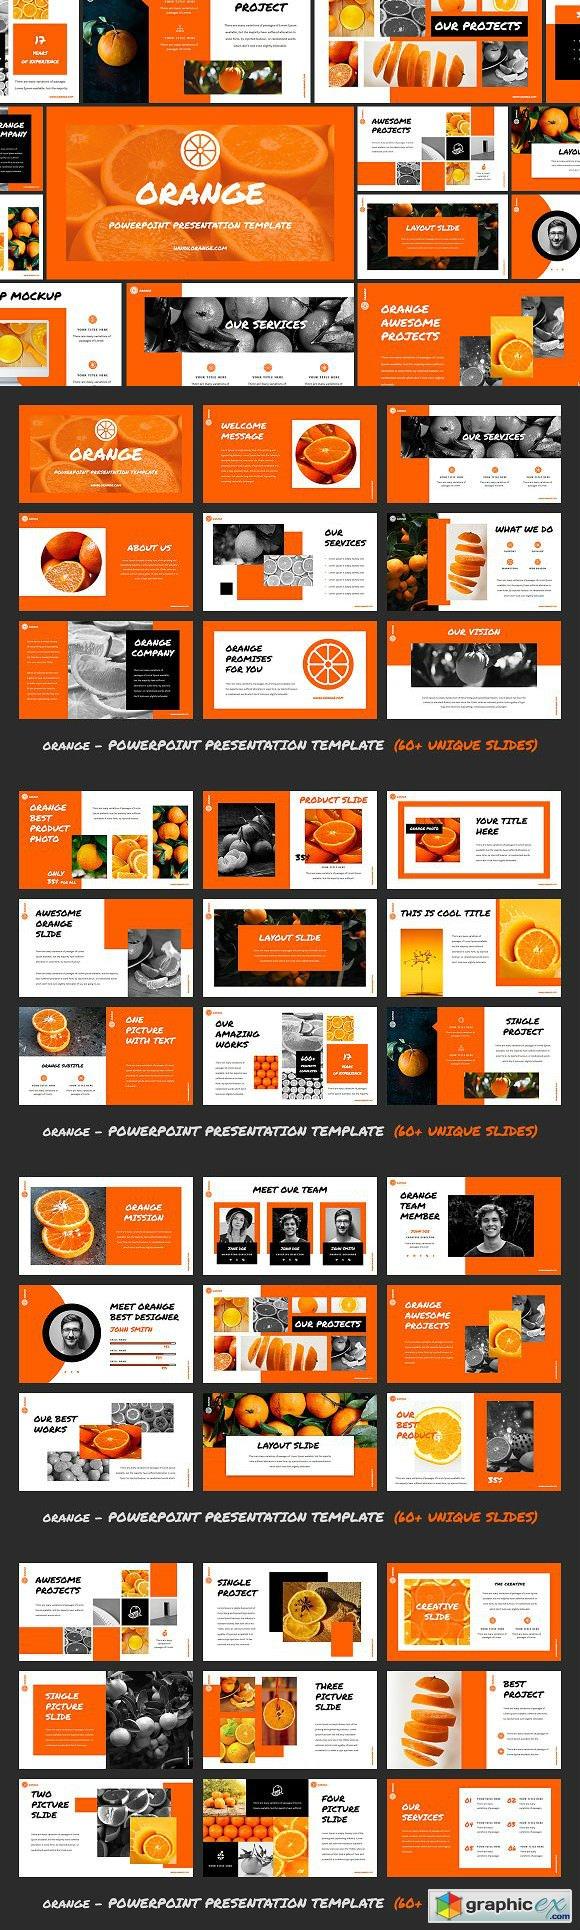 Orange - Powerpoint Template